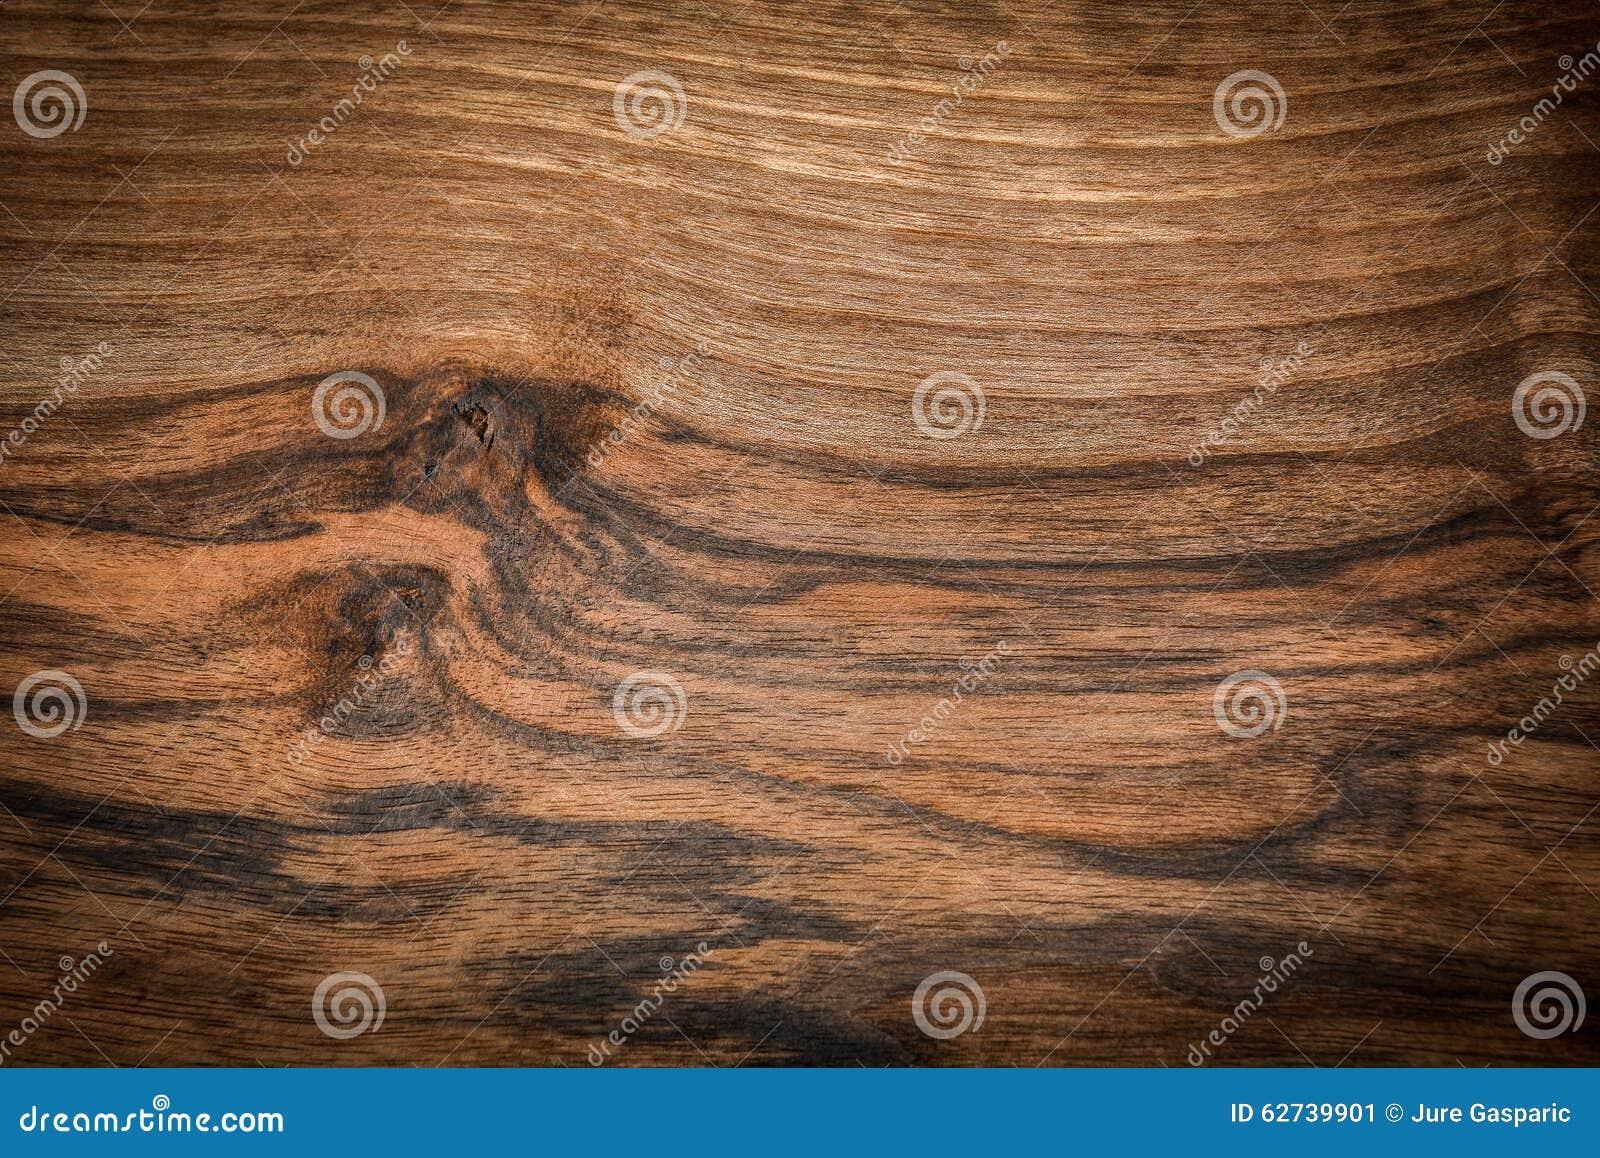 Patern background texture en bois naturel image stock image du